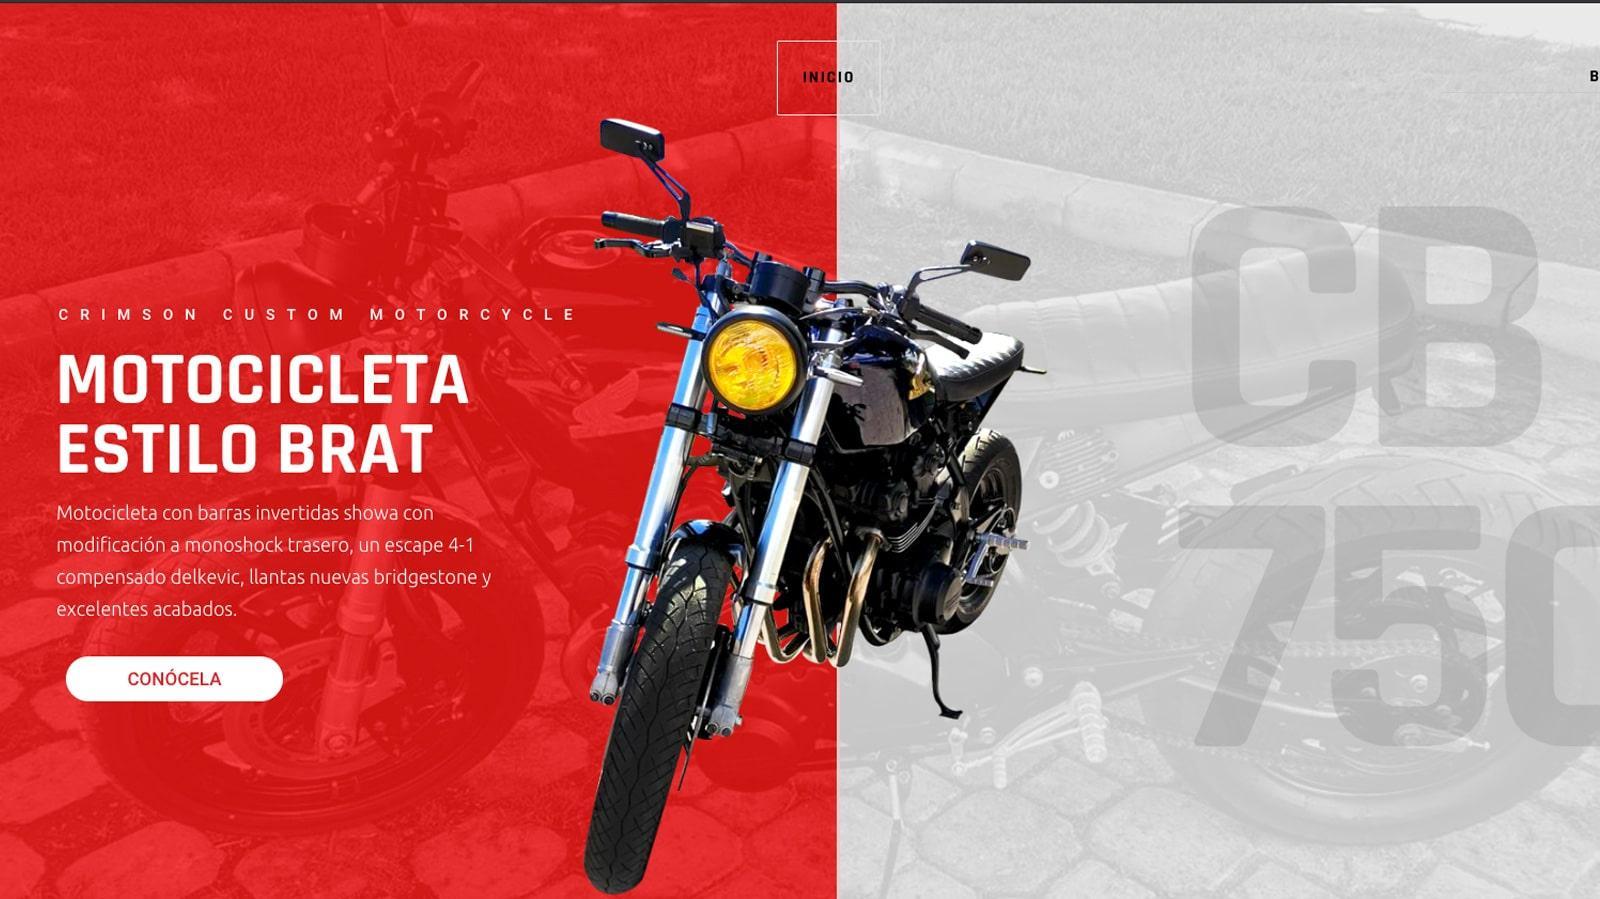 Crimson Motorcycles